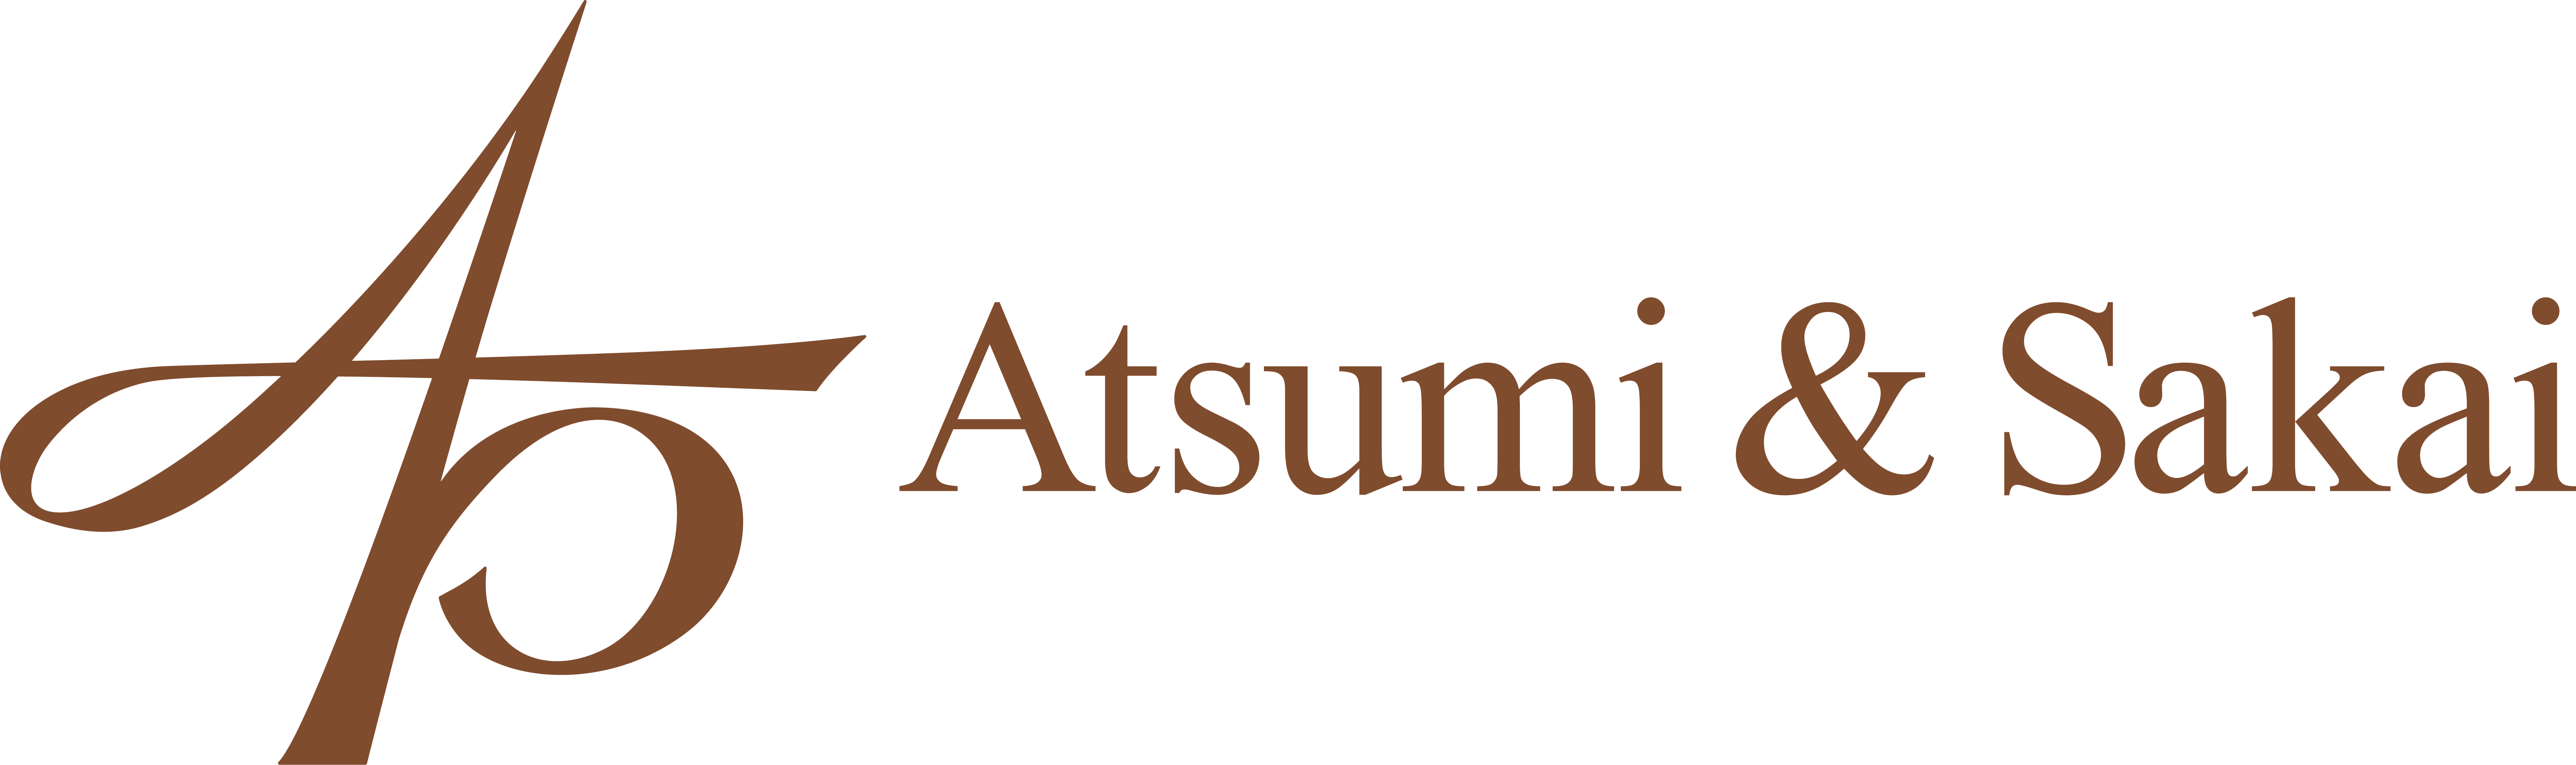 Atsumi&Sakai